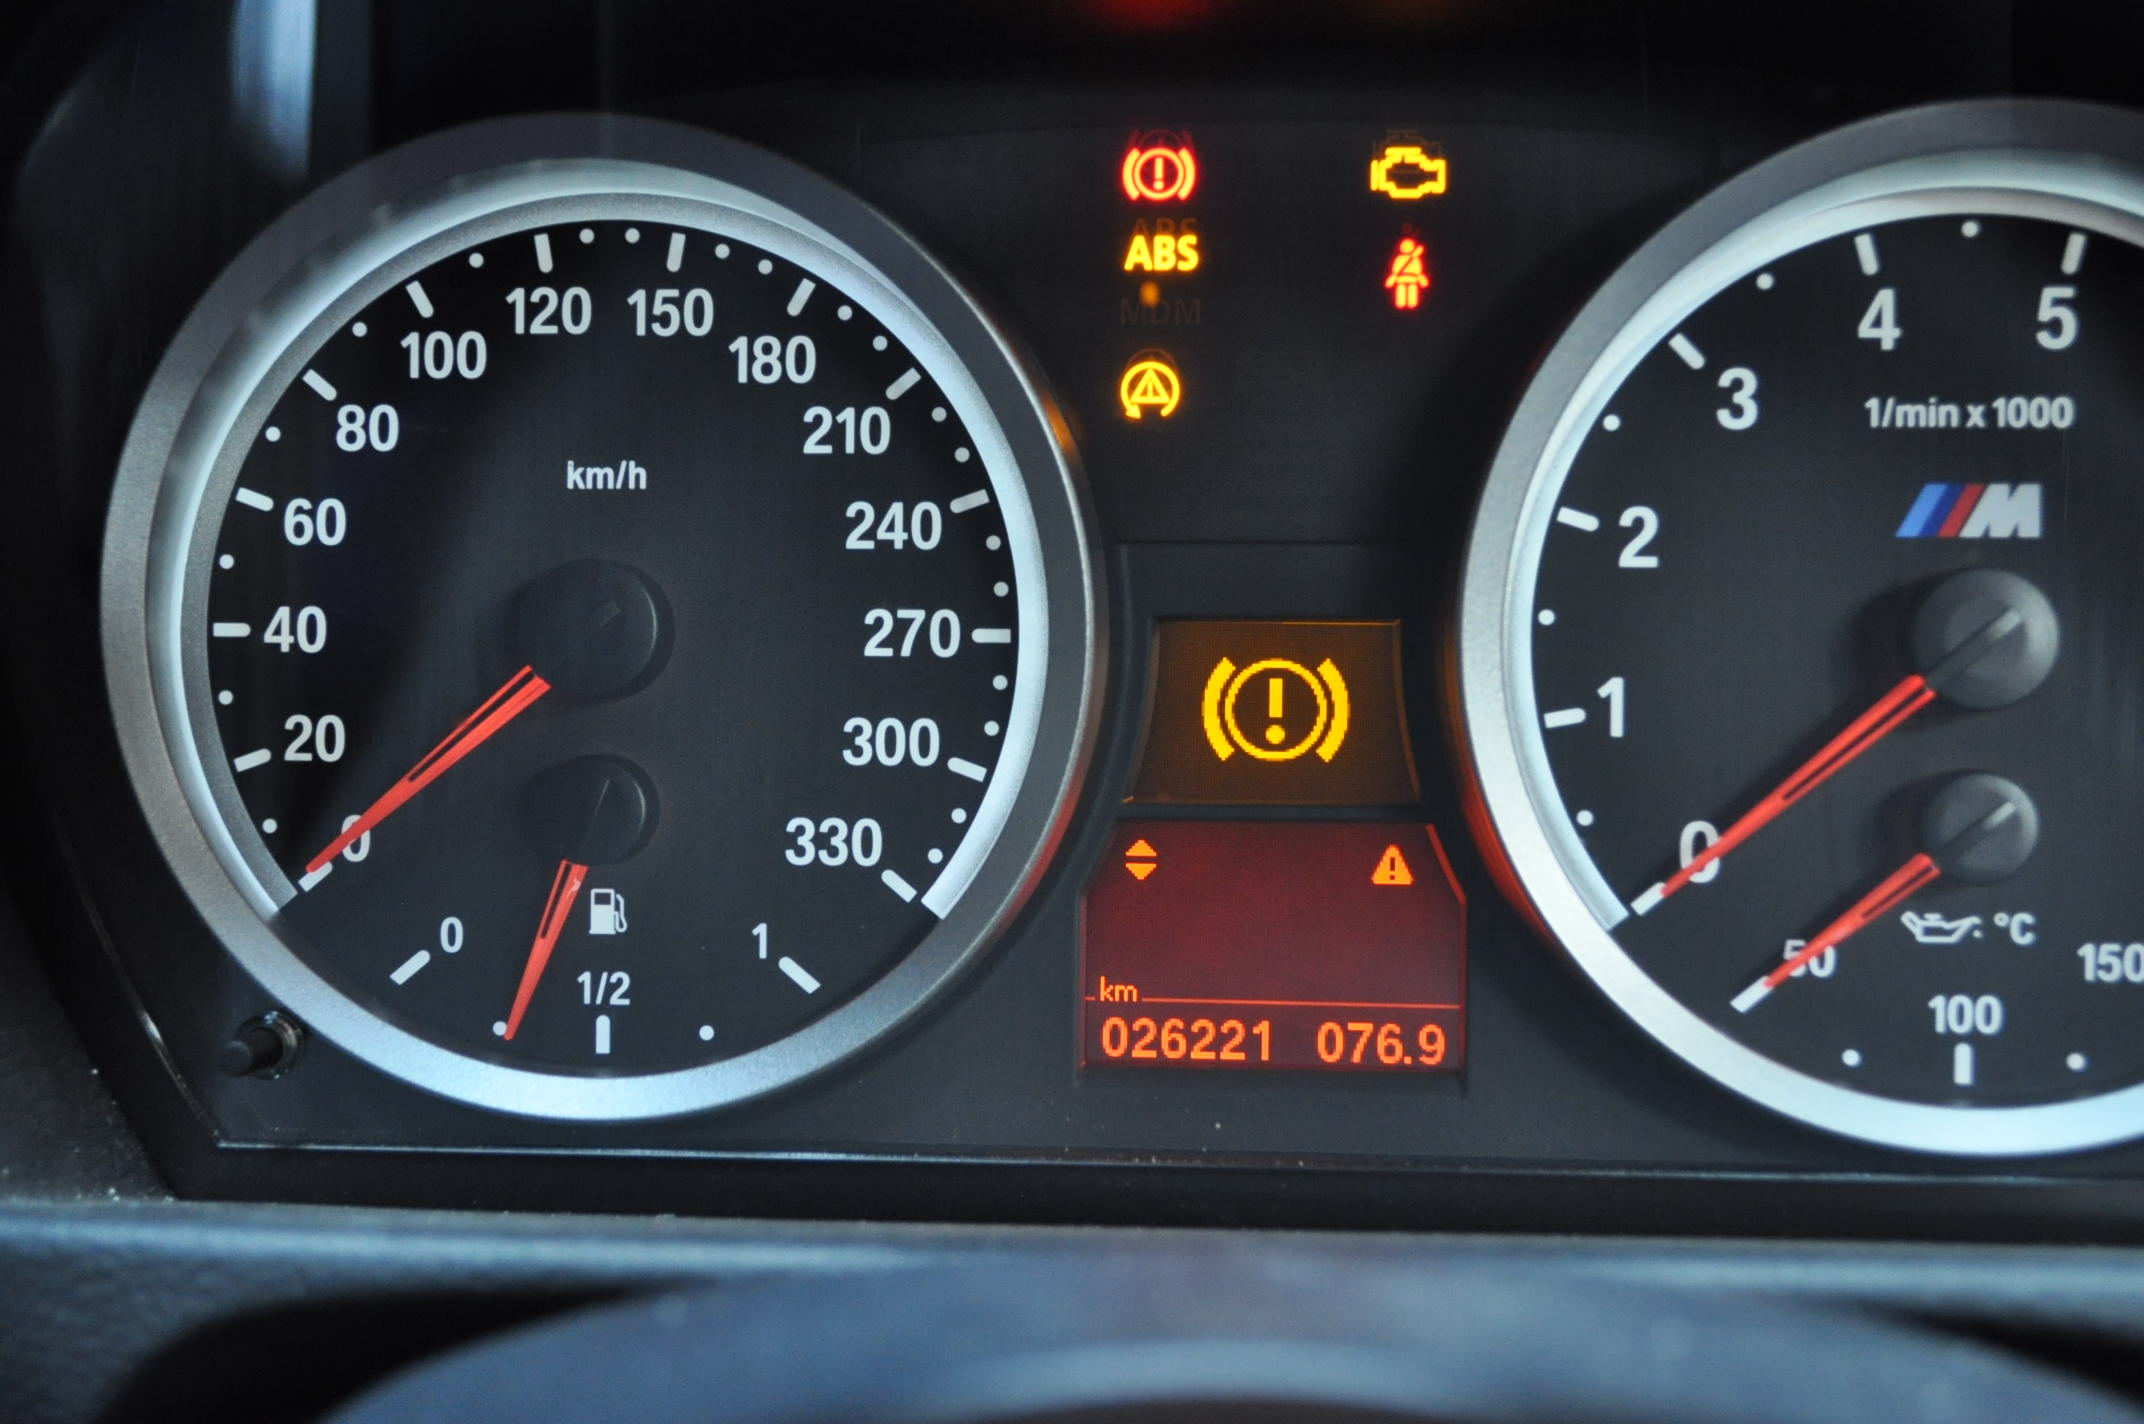 GT-R、ABSユニット故障時のランプ点灯の様子1